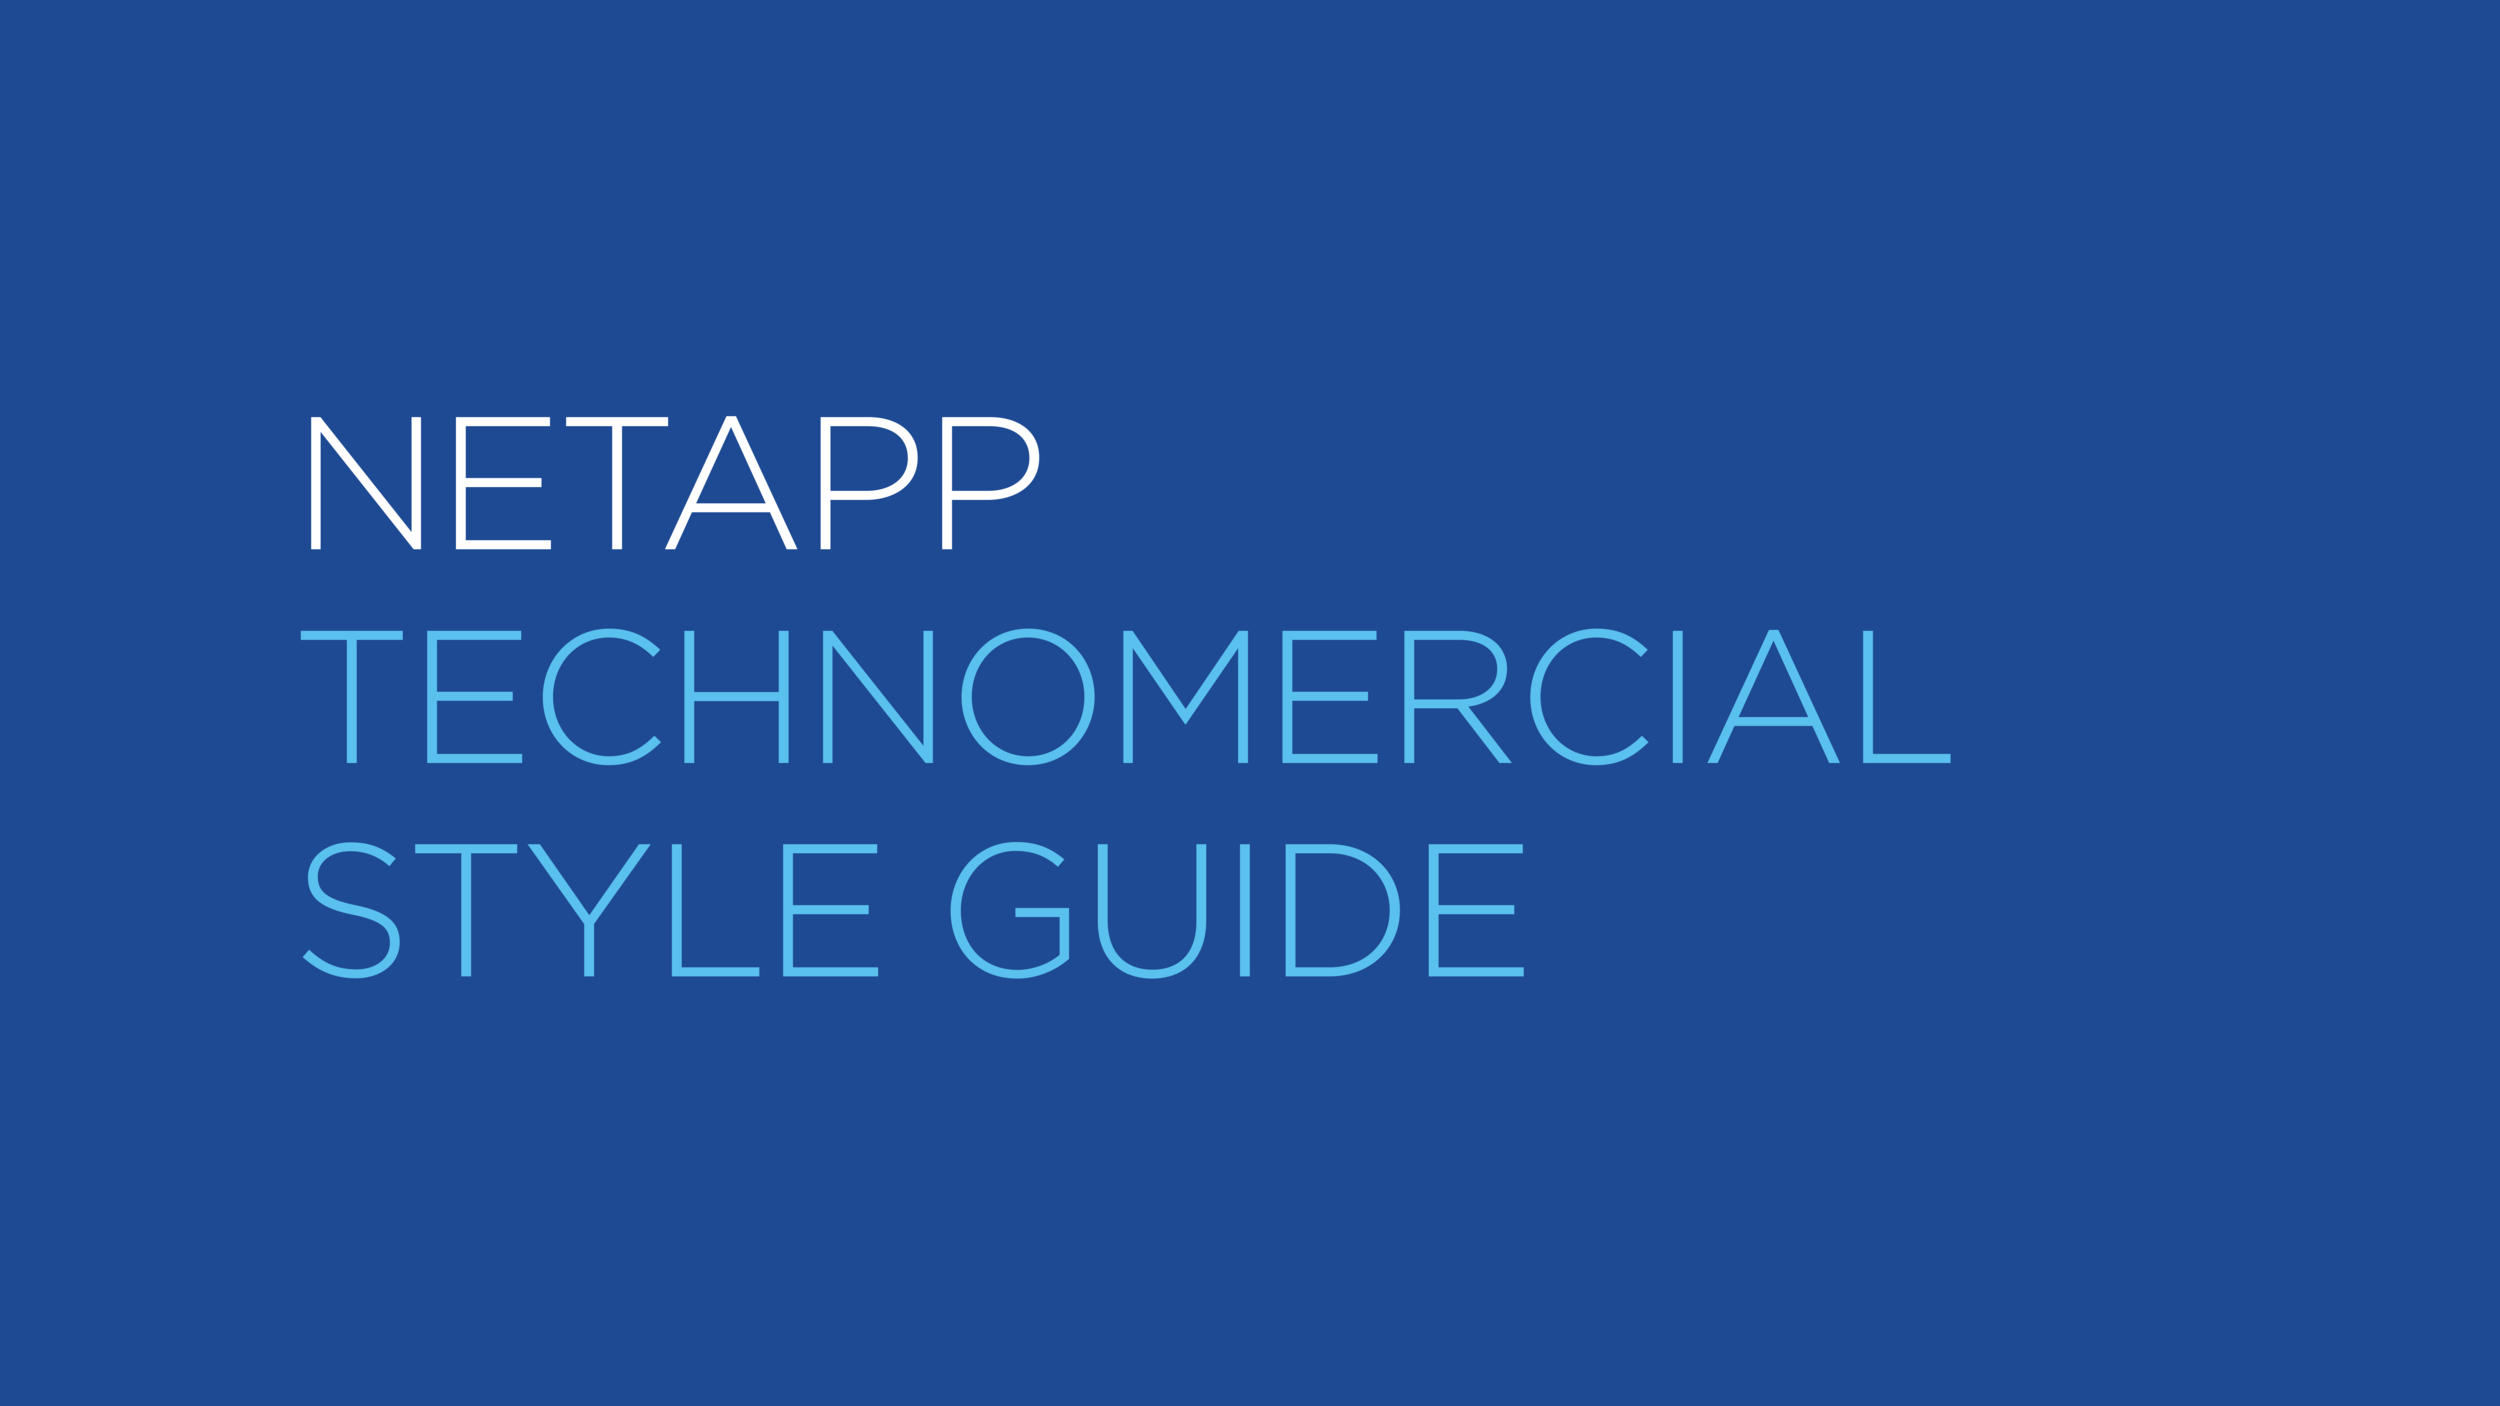 NetApp_Technomercial_Guidelines_01-2.png